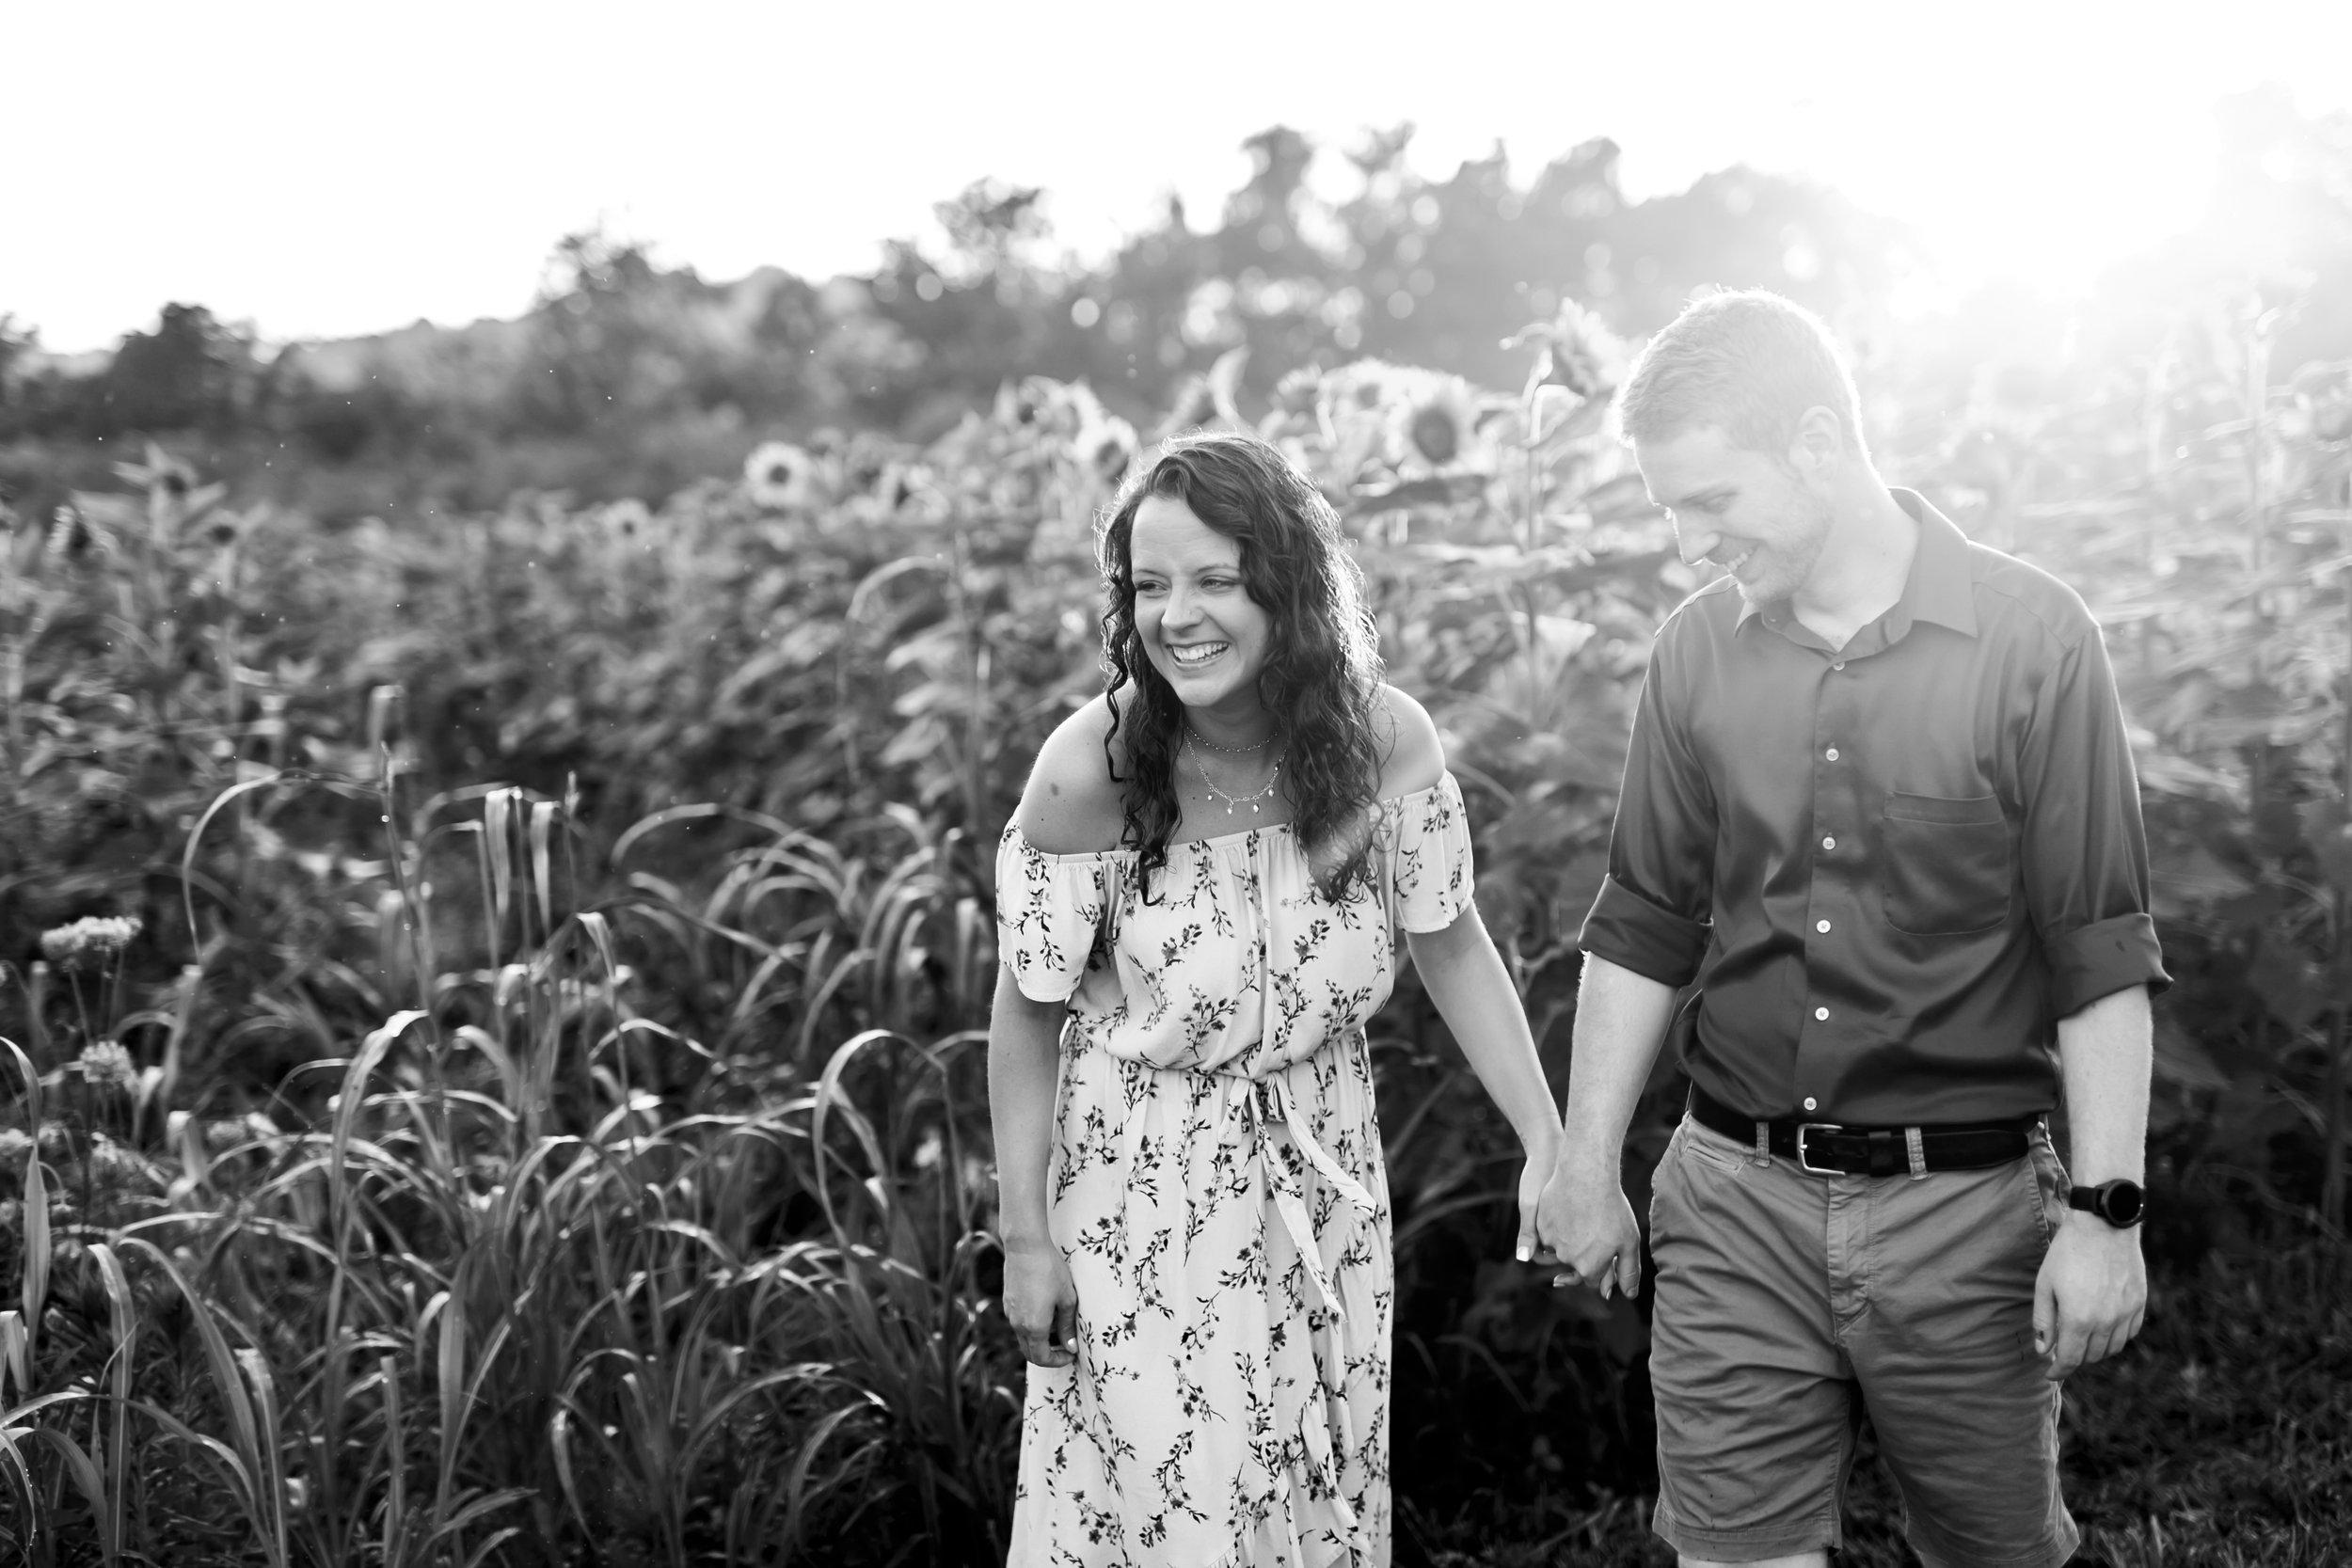 Nick&Beth201907020133.jpg